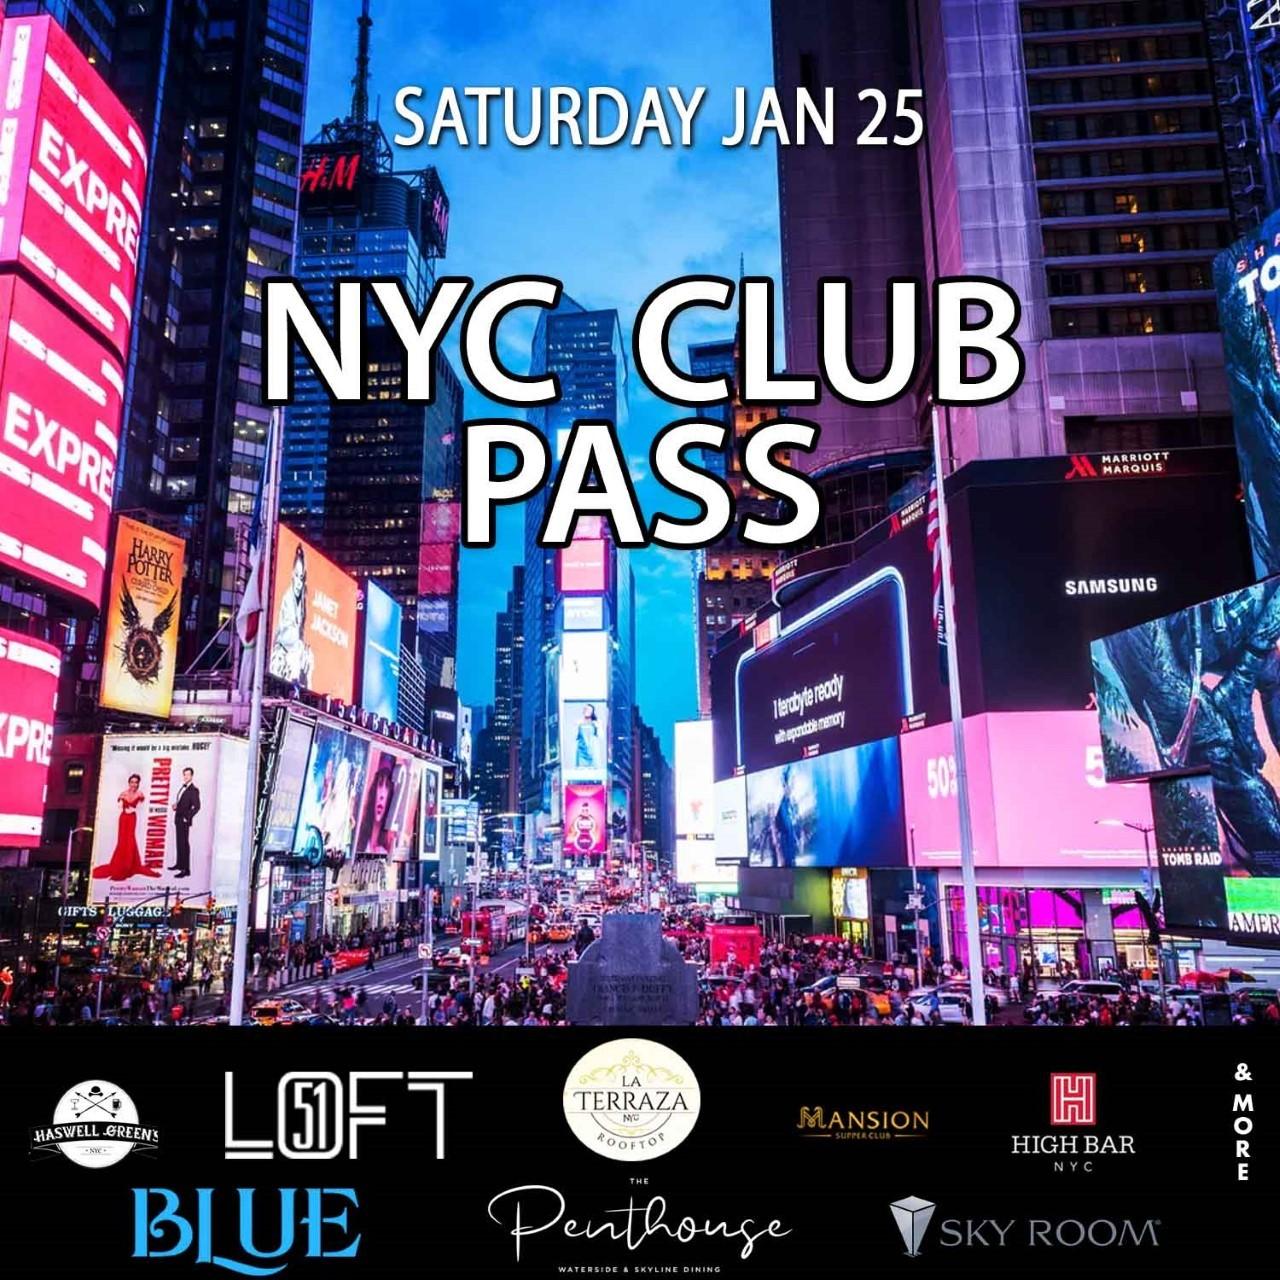 NYC Club Hop Pub Crawl 2020 only $15 NYC Club Hop Pub Crawl 2020 only $15 on Jan 25, 20:00@Loft 51 NYC - Buy tickets and Get information on GametightNY